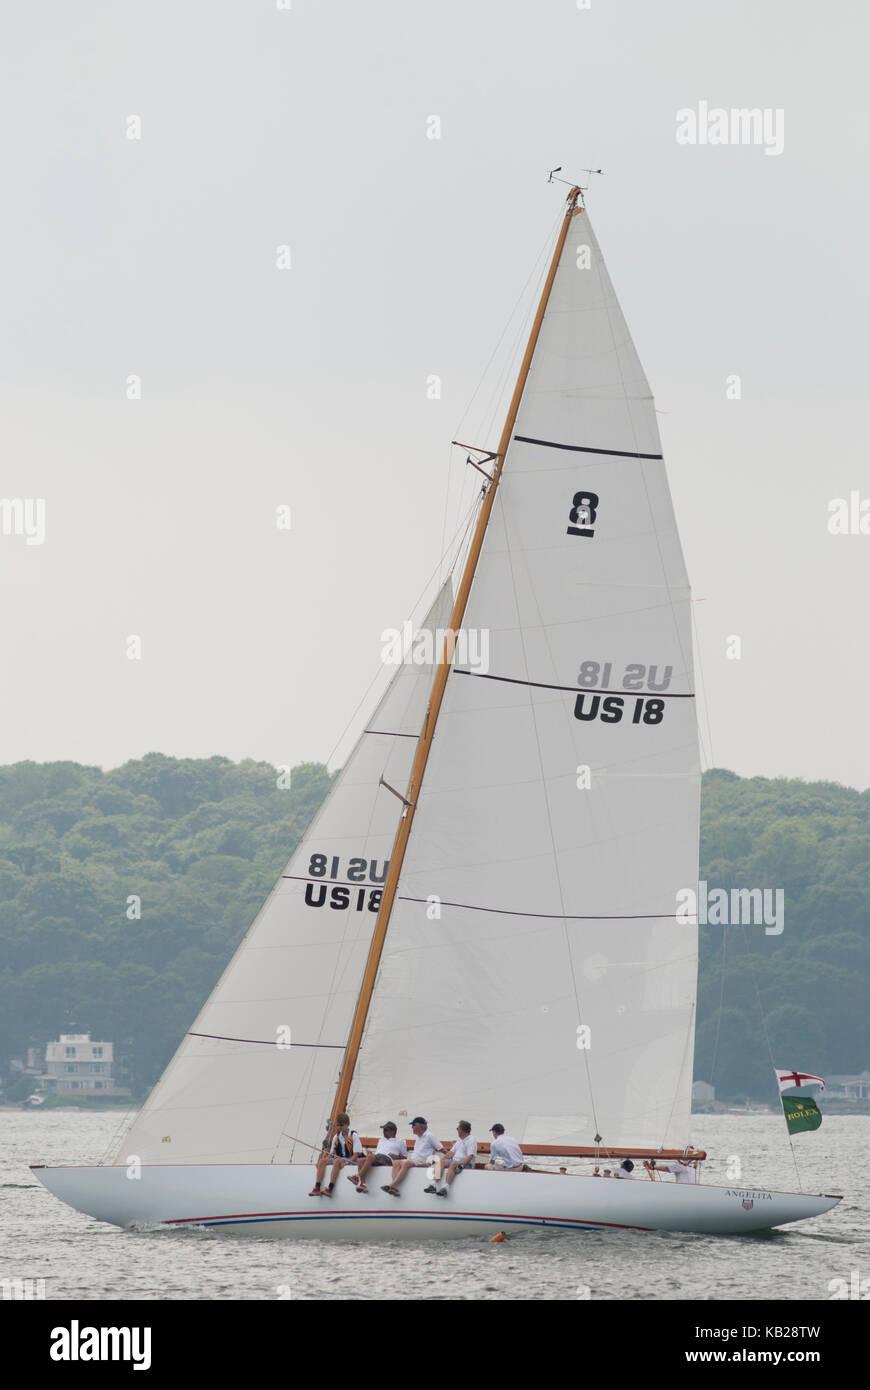 Sailboat Angelita, an 8M class double-ender built in 1928, sails in Narragansett Bay, Rhode Island. - Stock Image